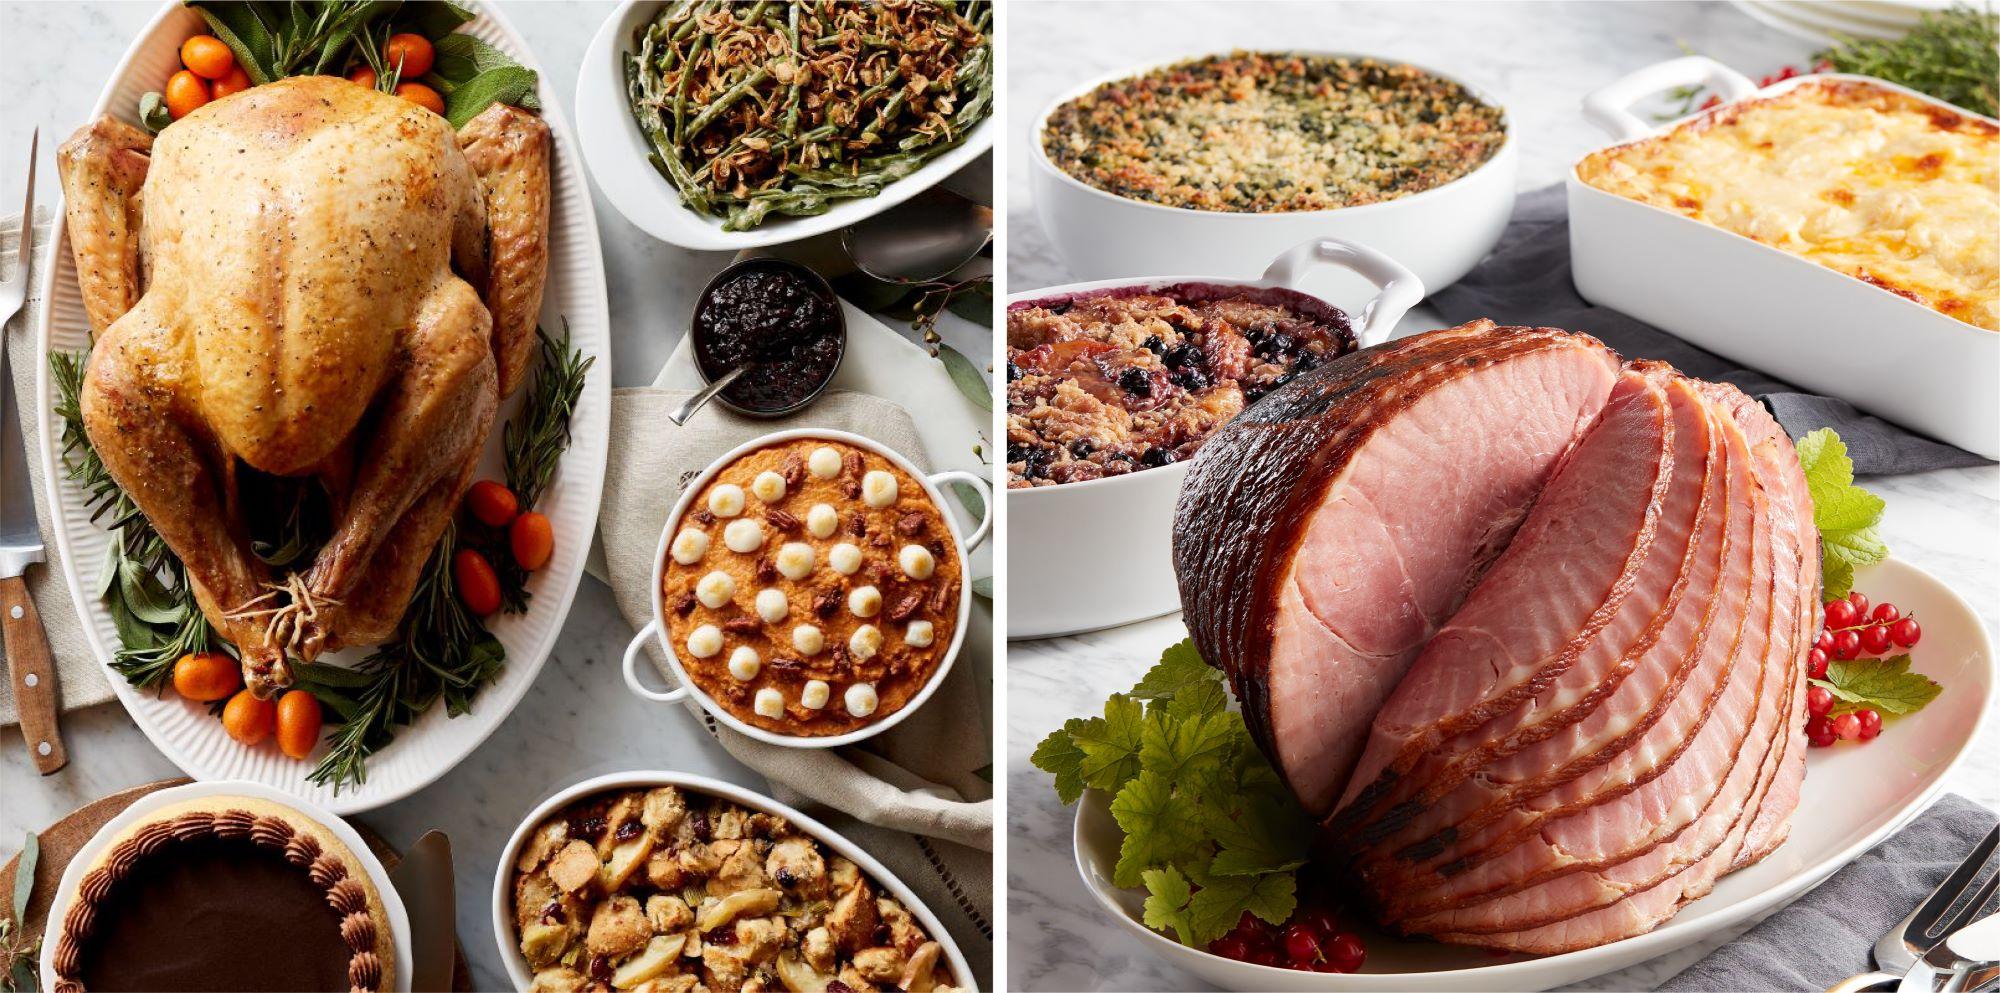 Premium Turkey Dinner and Deluxe Holiday Ham Dinner